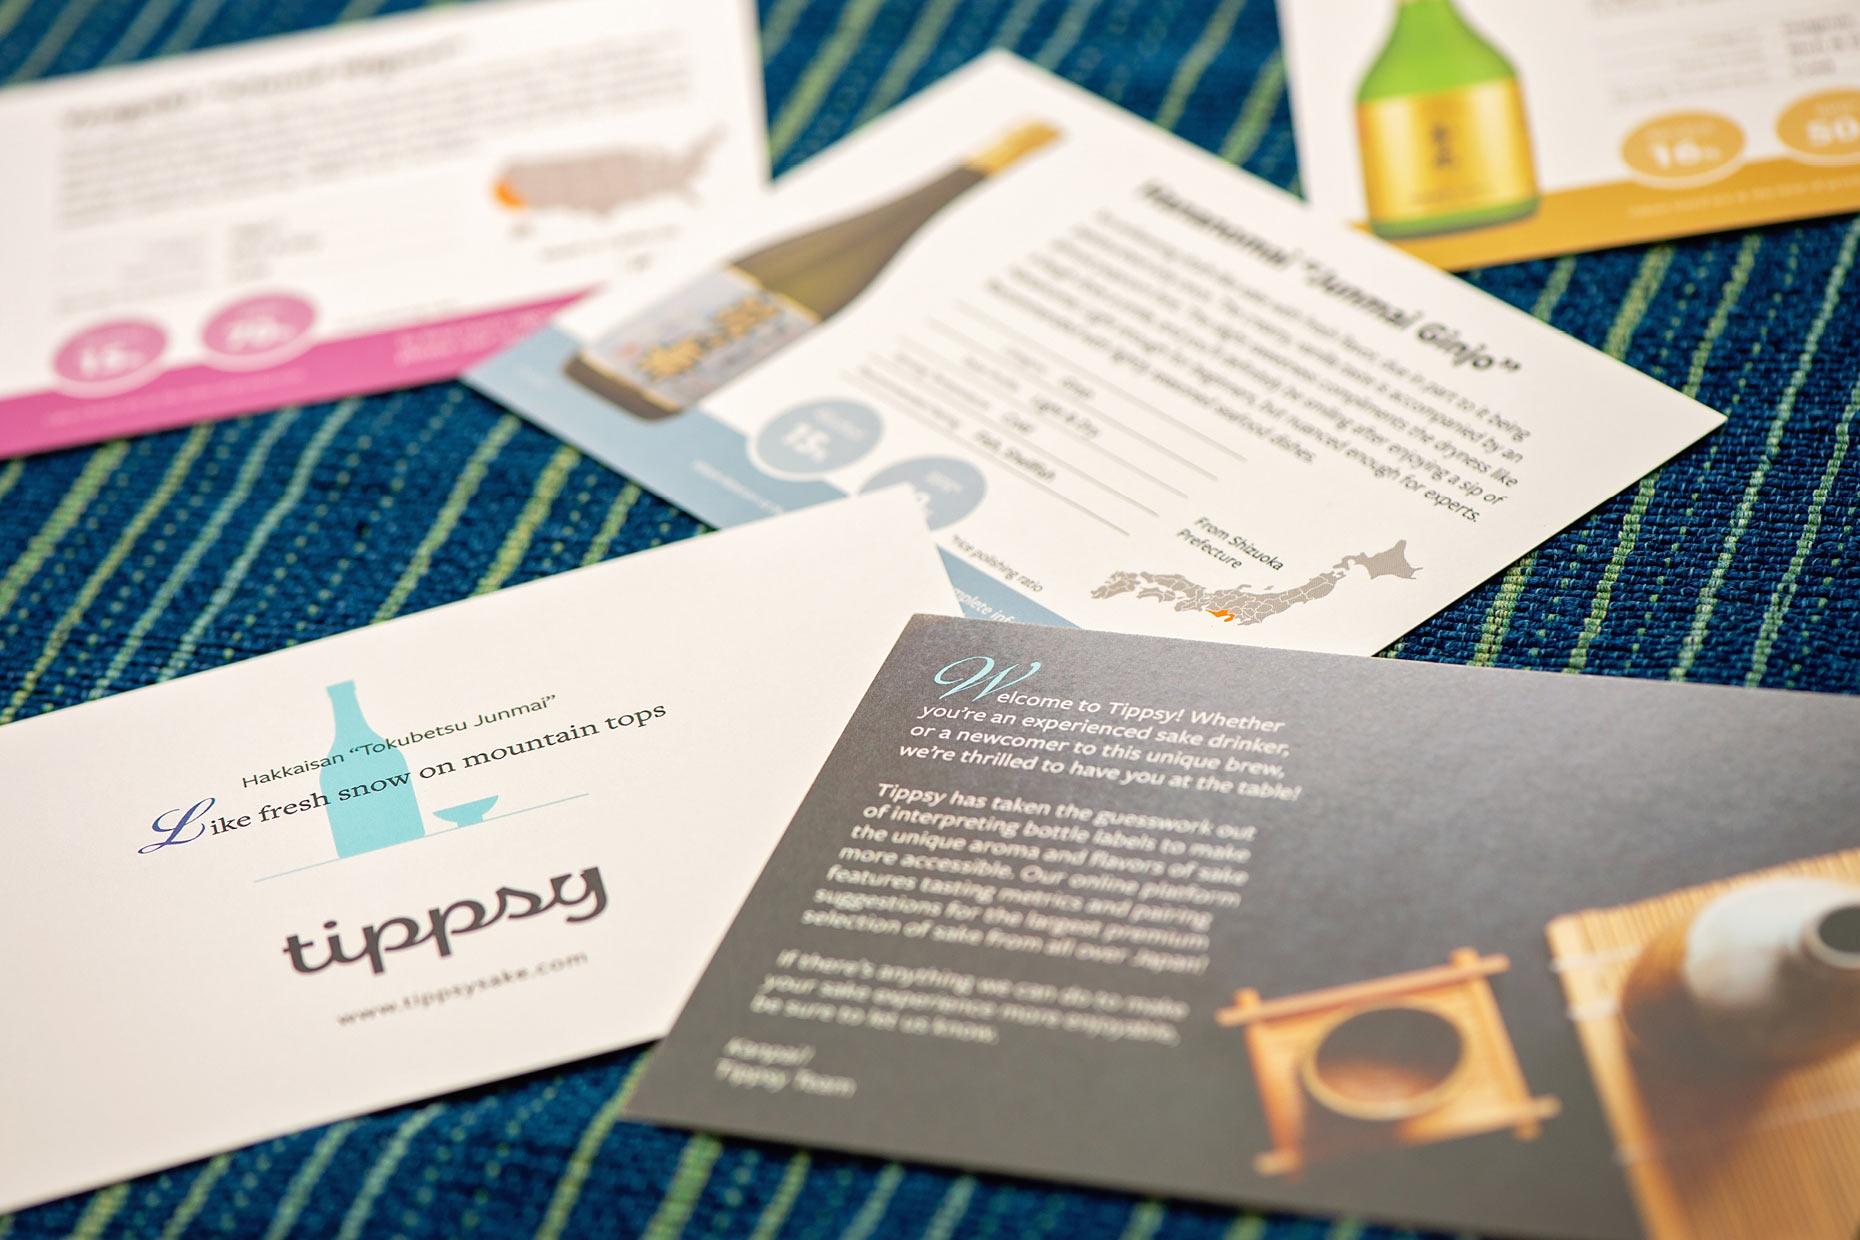 Tippsy Sake cards